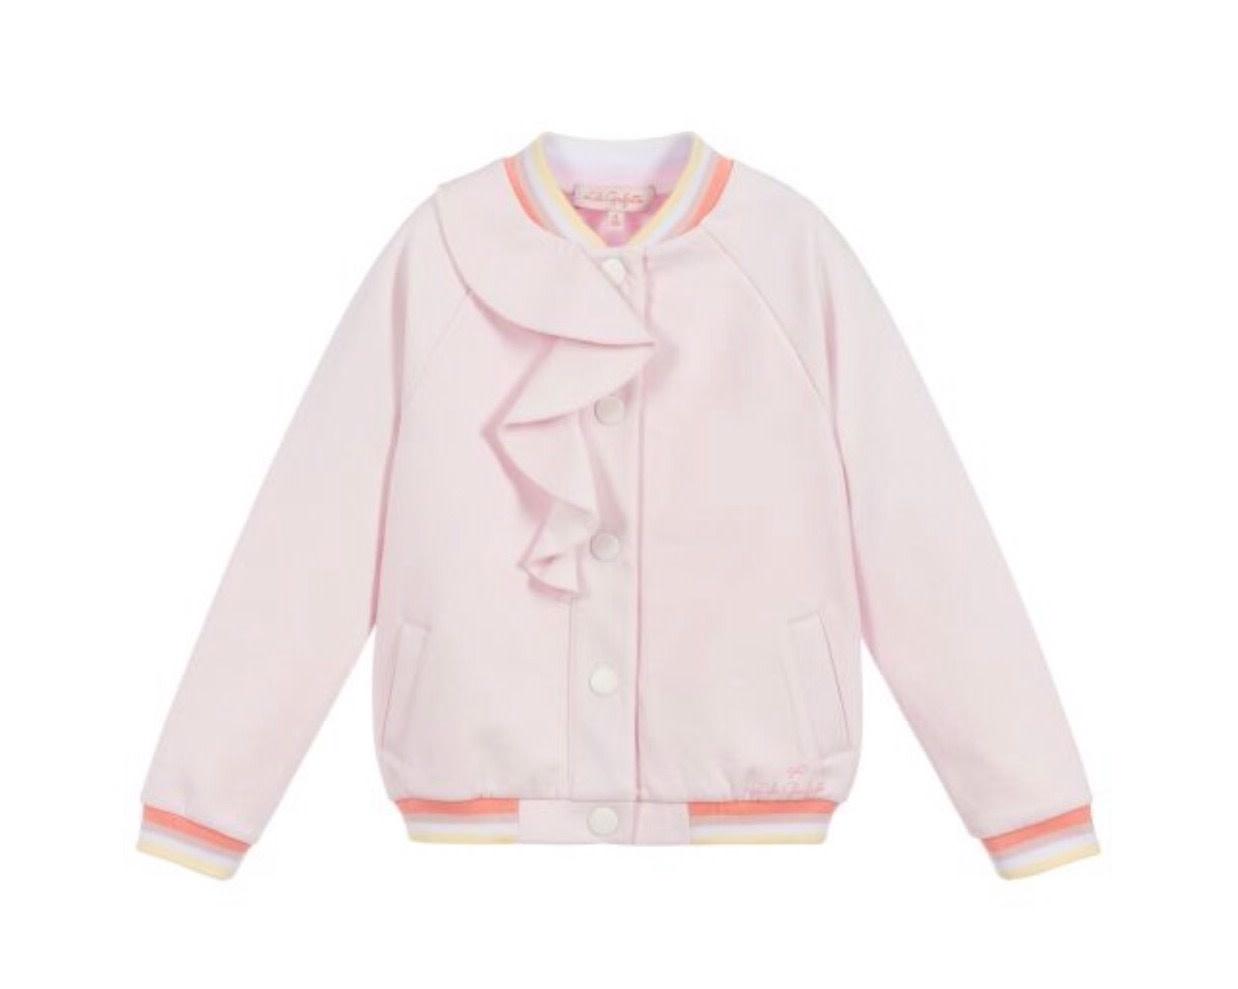 Lili Gaufrette Lili Gaufrette 40002 Pink Jacket with Ruffle